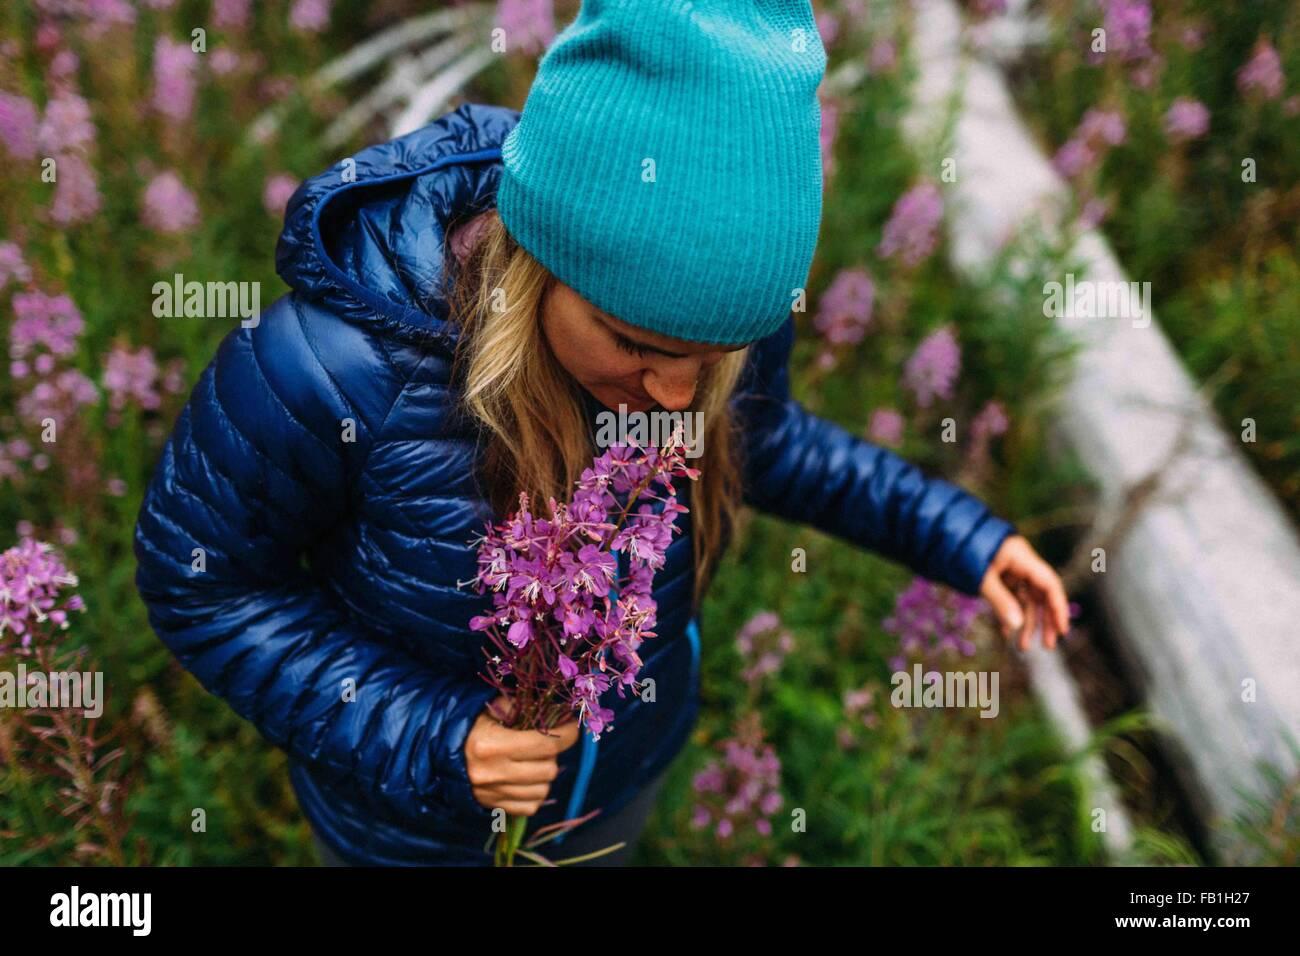 High angle view Mid adult woman wearing Knit hat holding manteau rembourré au lac Moraine, fleurs sauvages Photo Stock